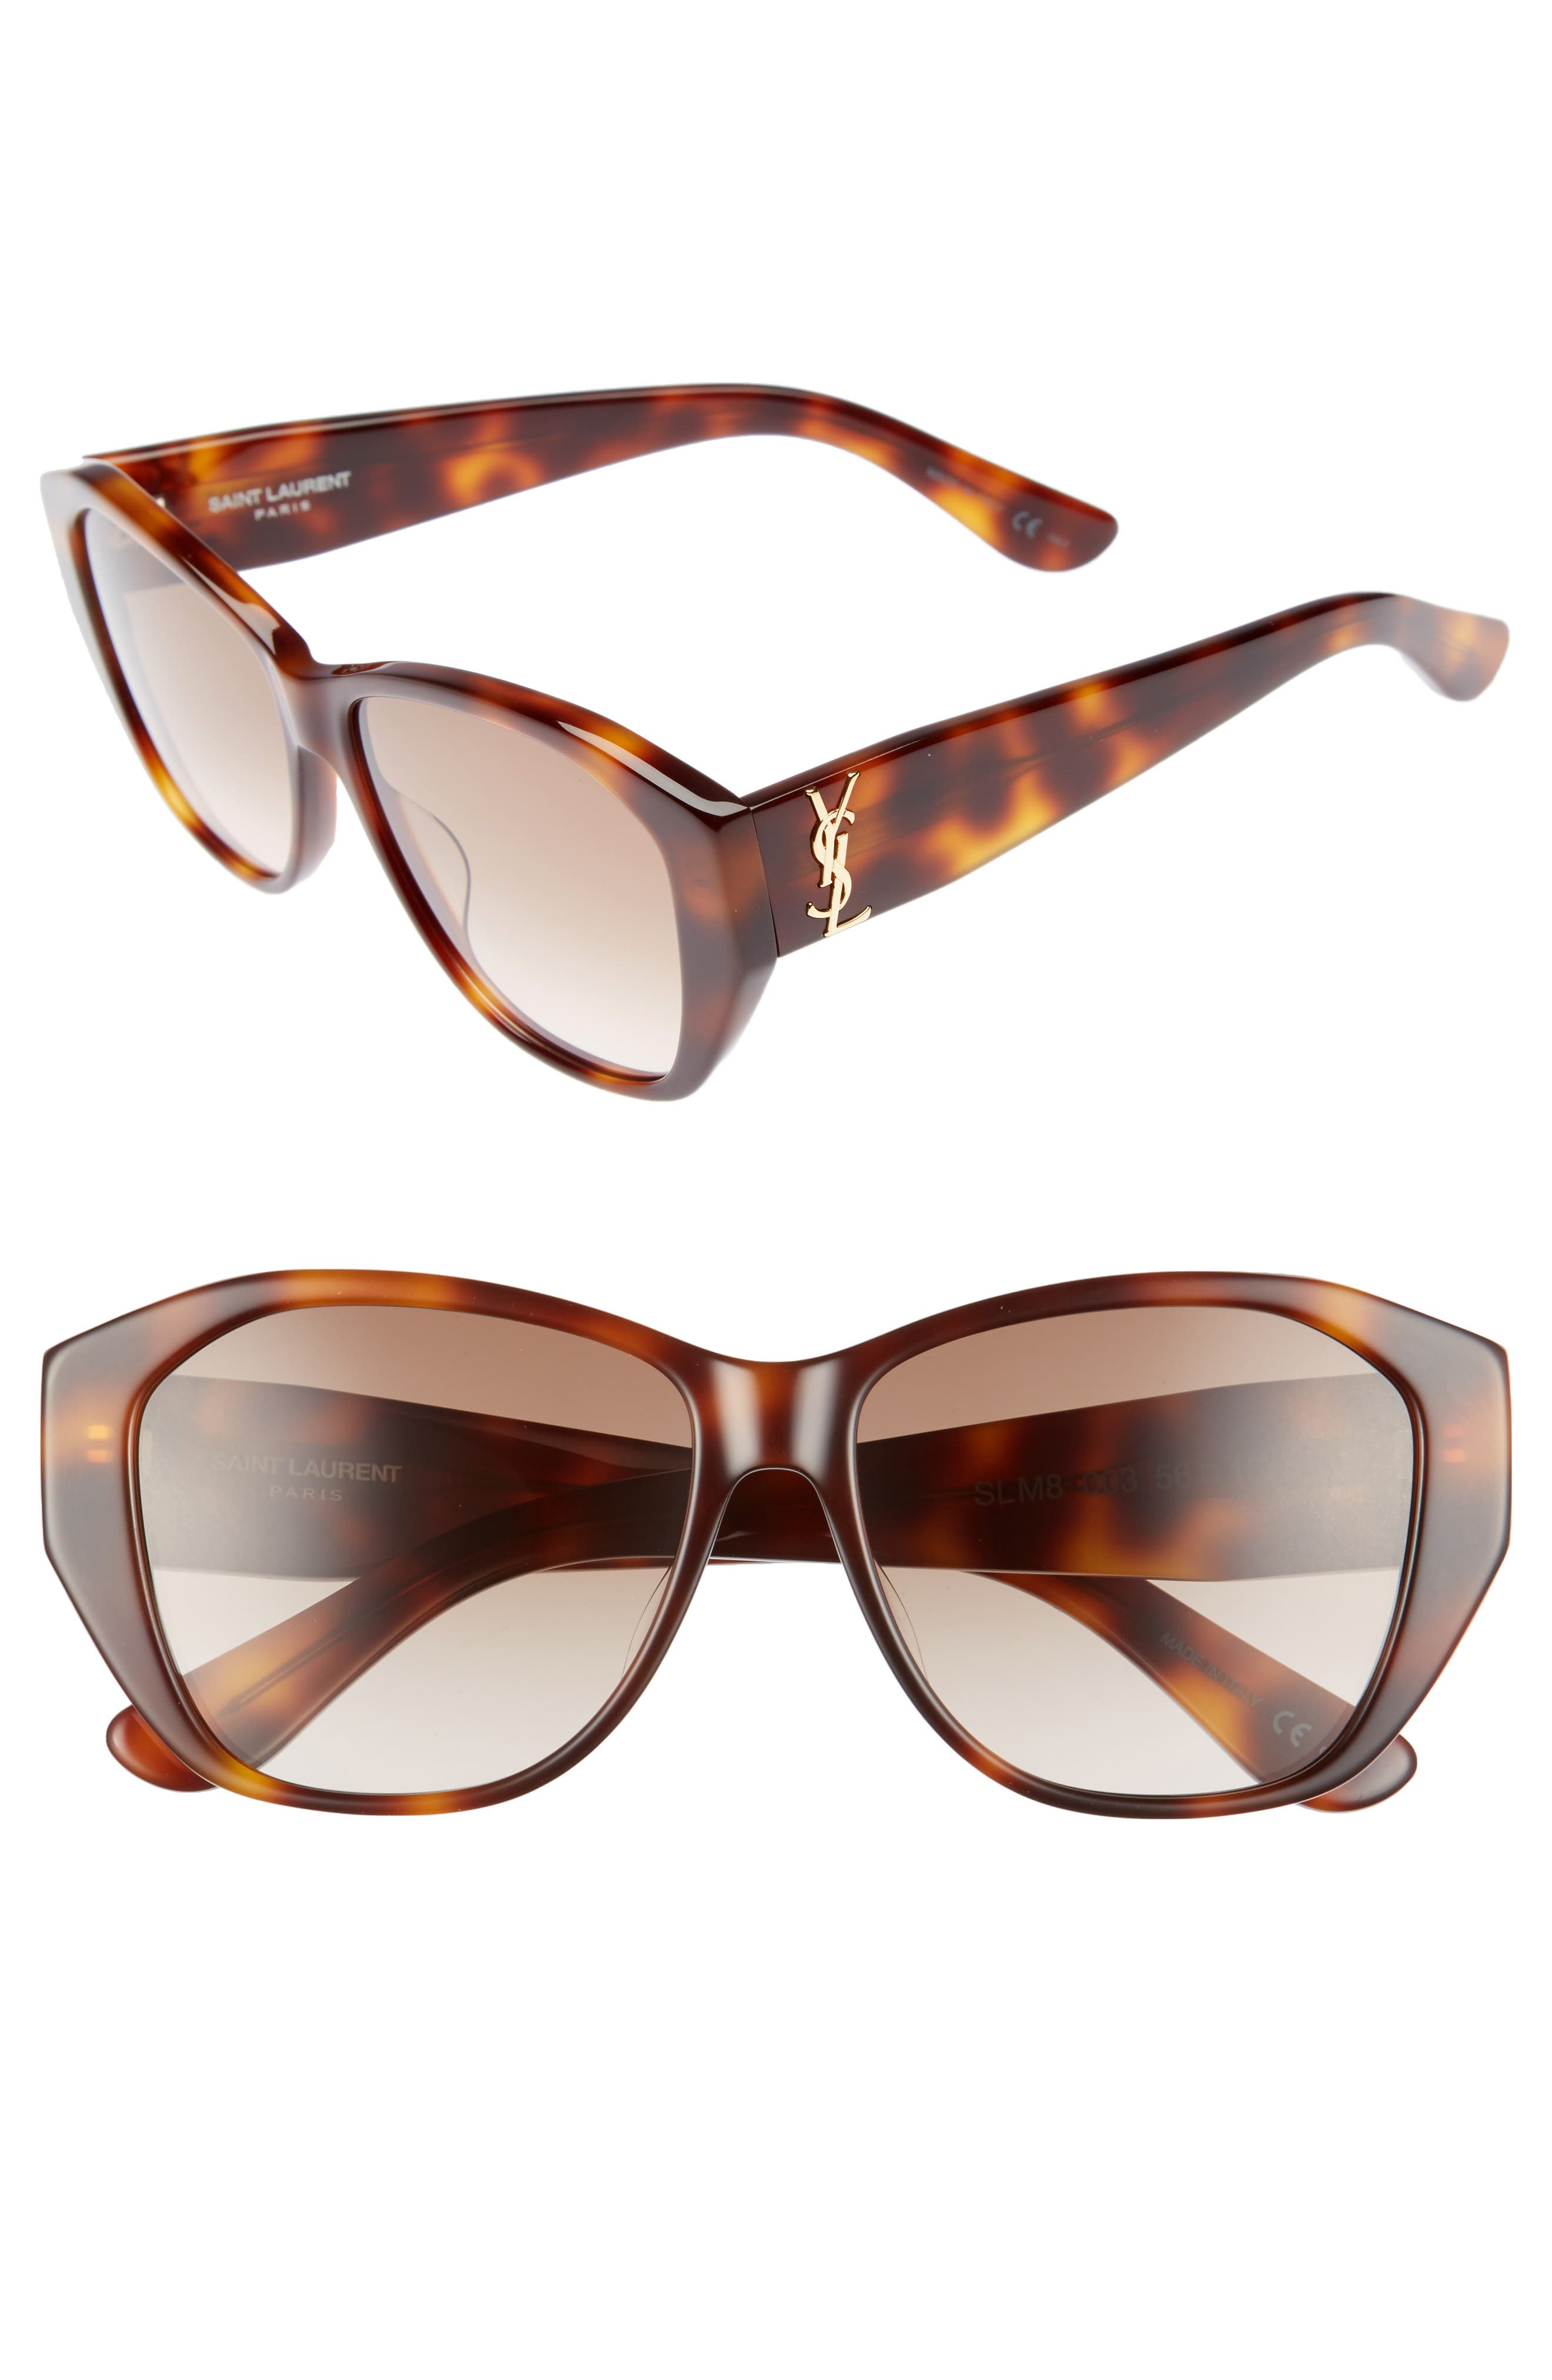 56mm Sunglasses,                             Main thumbnail 1, color,                             Havana/ Havana/ Brown